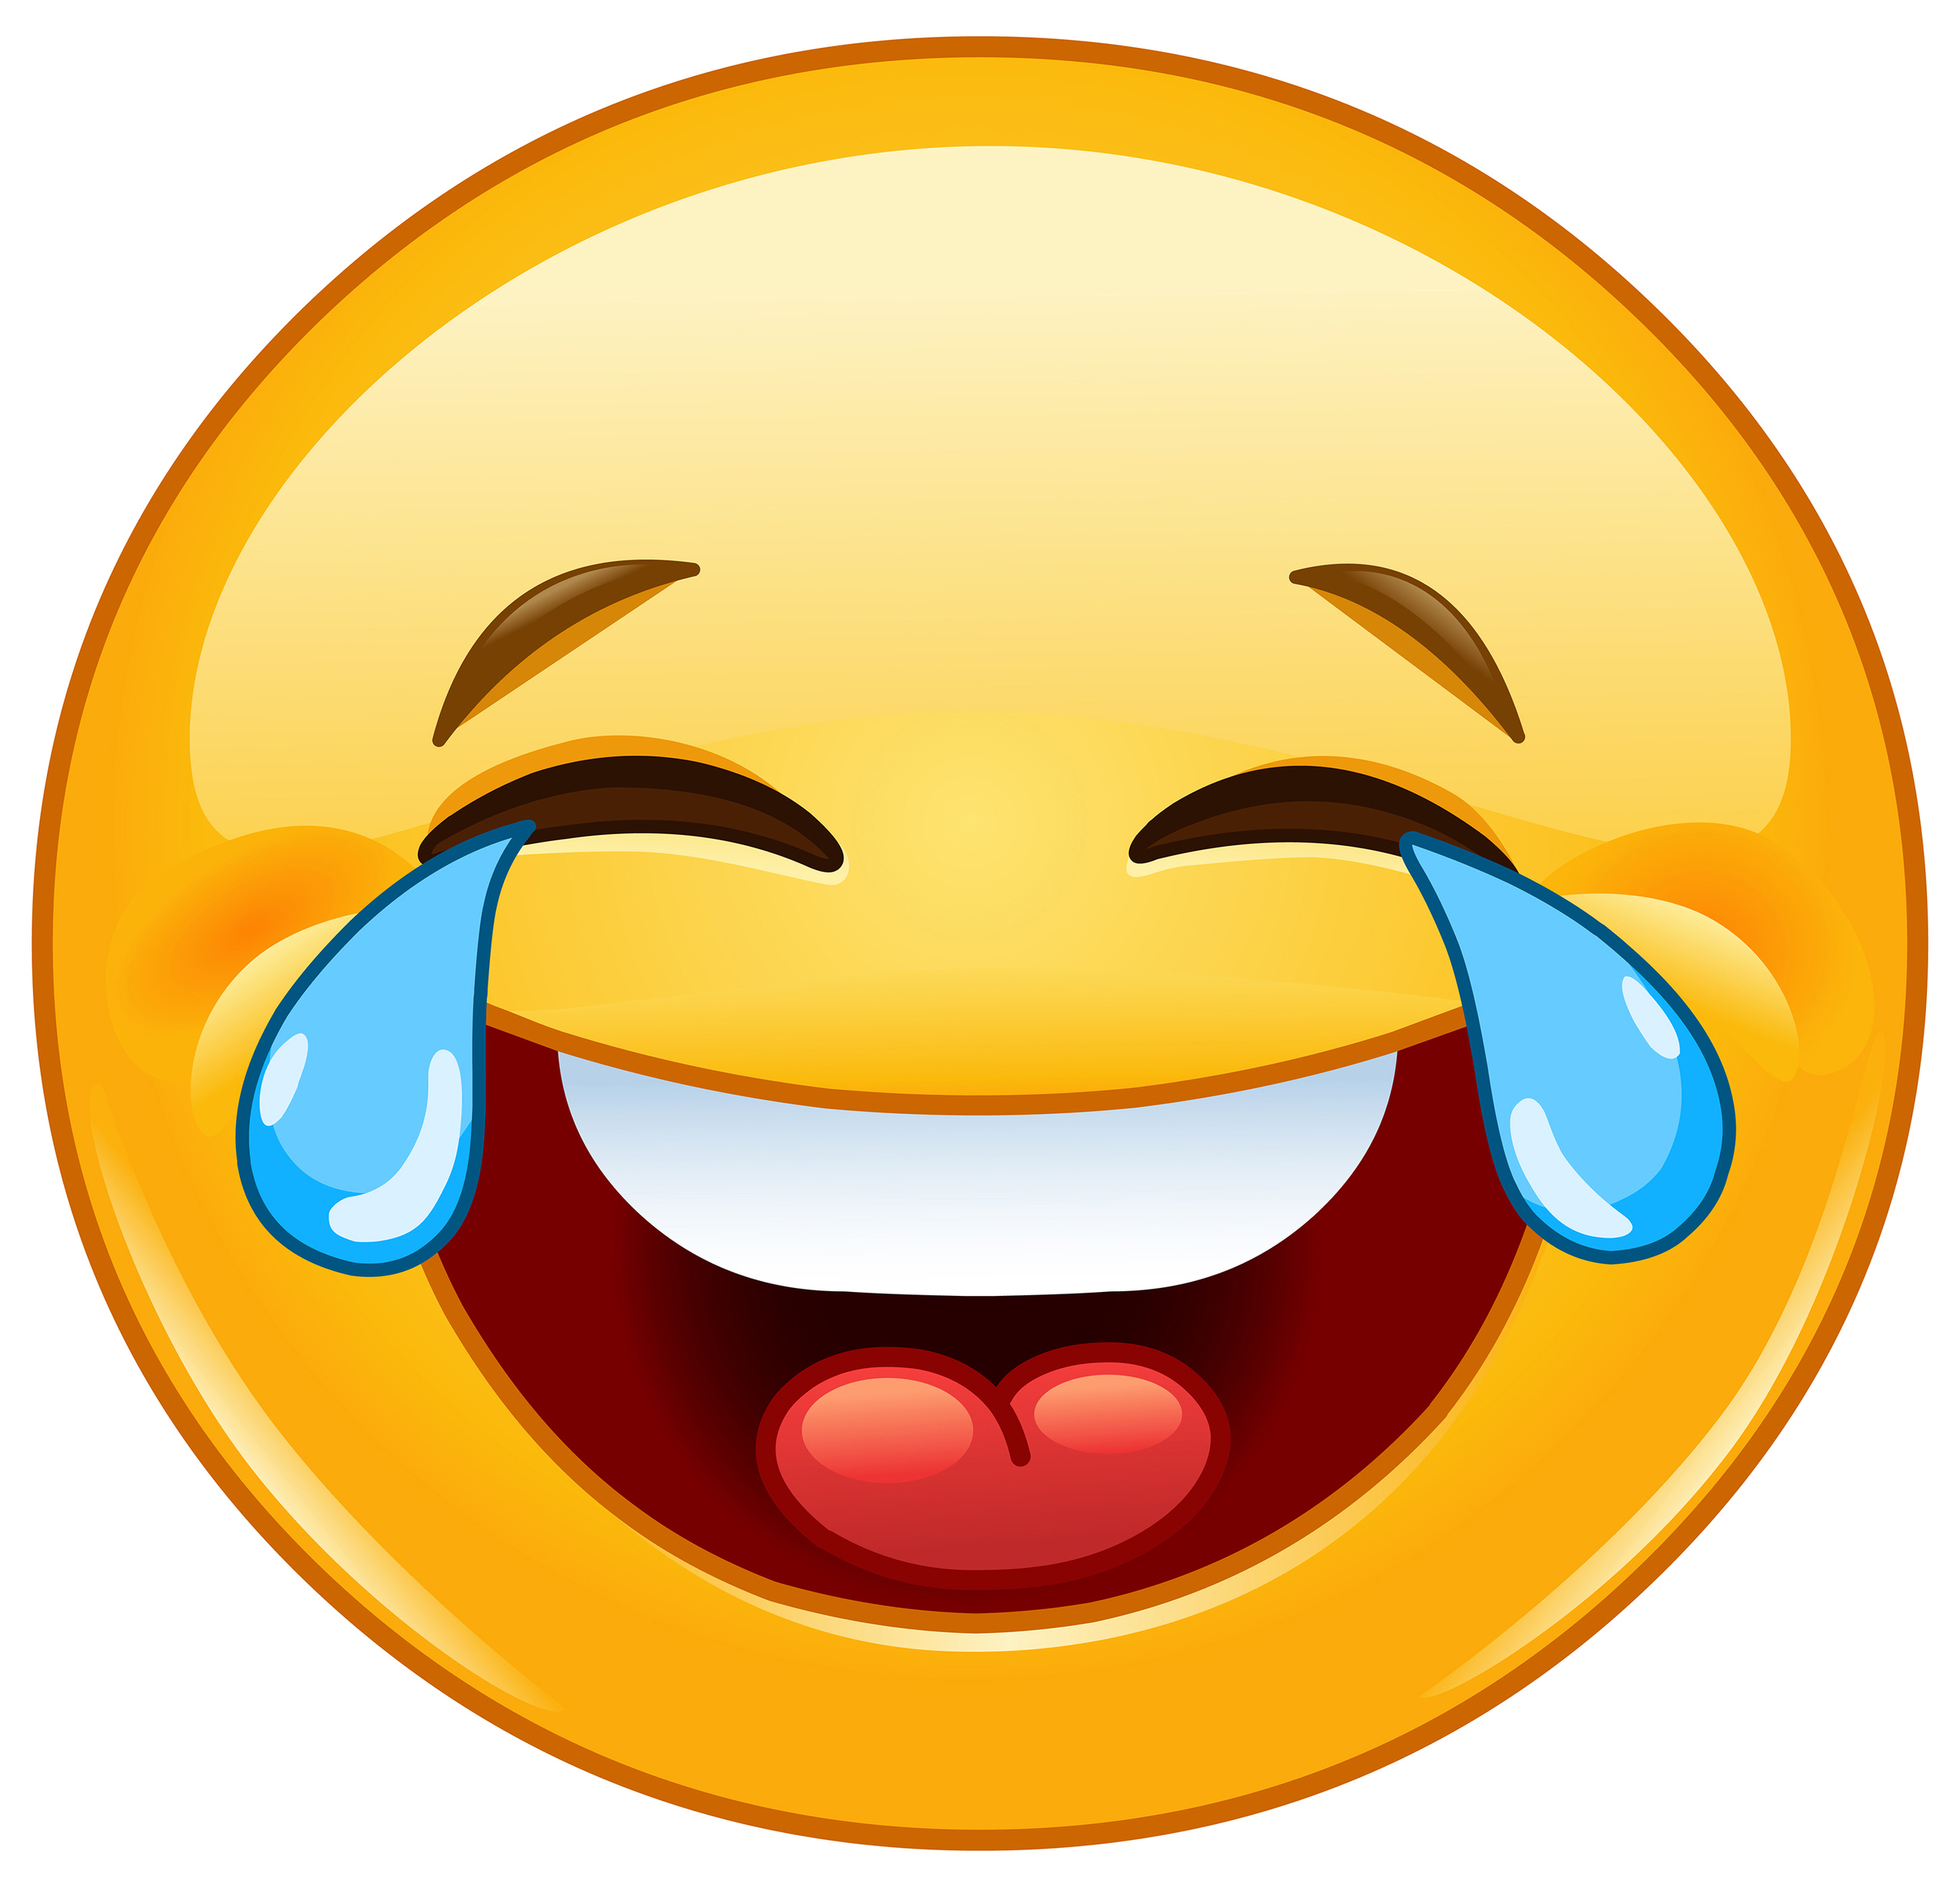 Emoticon with tears of joy - Illustration.jpg